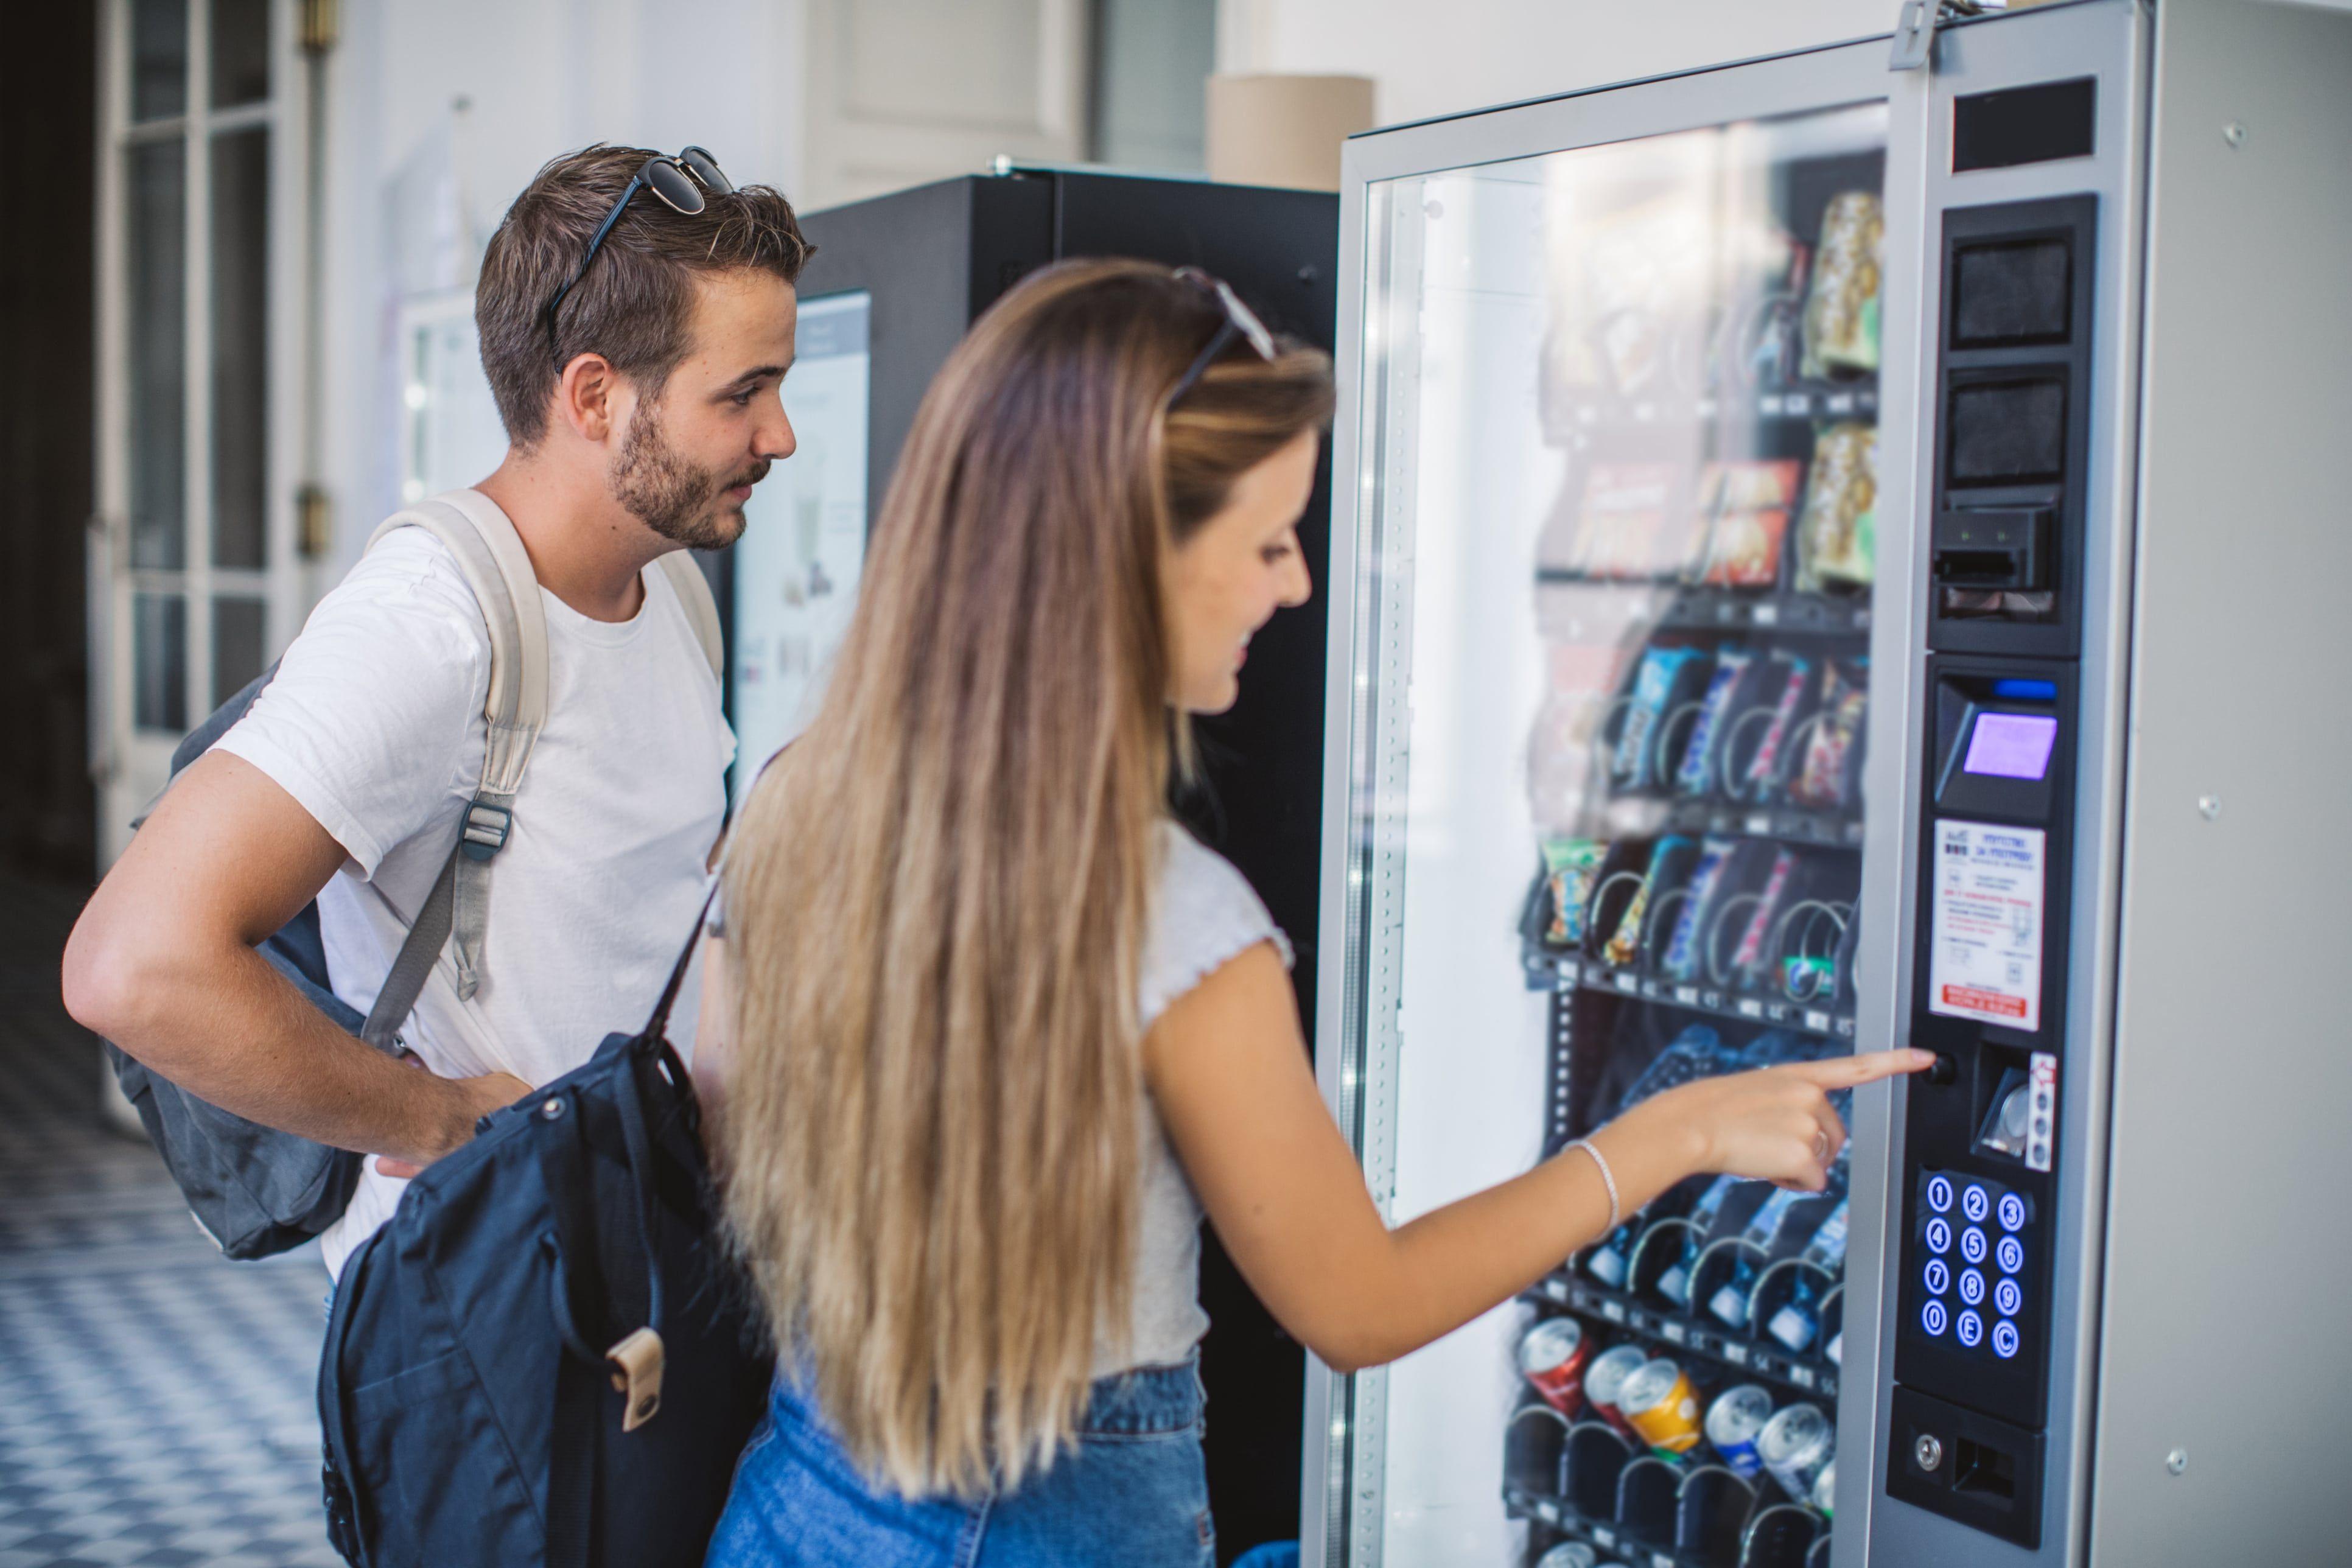 Foto de consumo vending 1